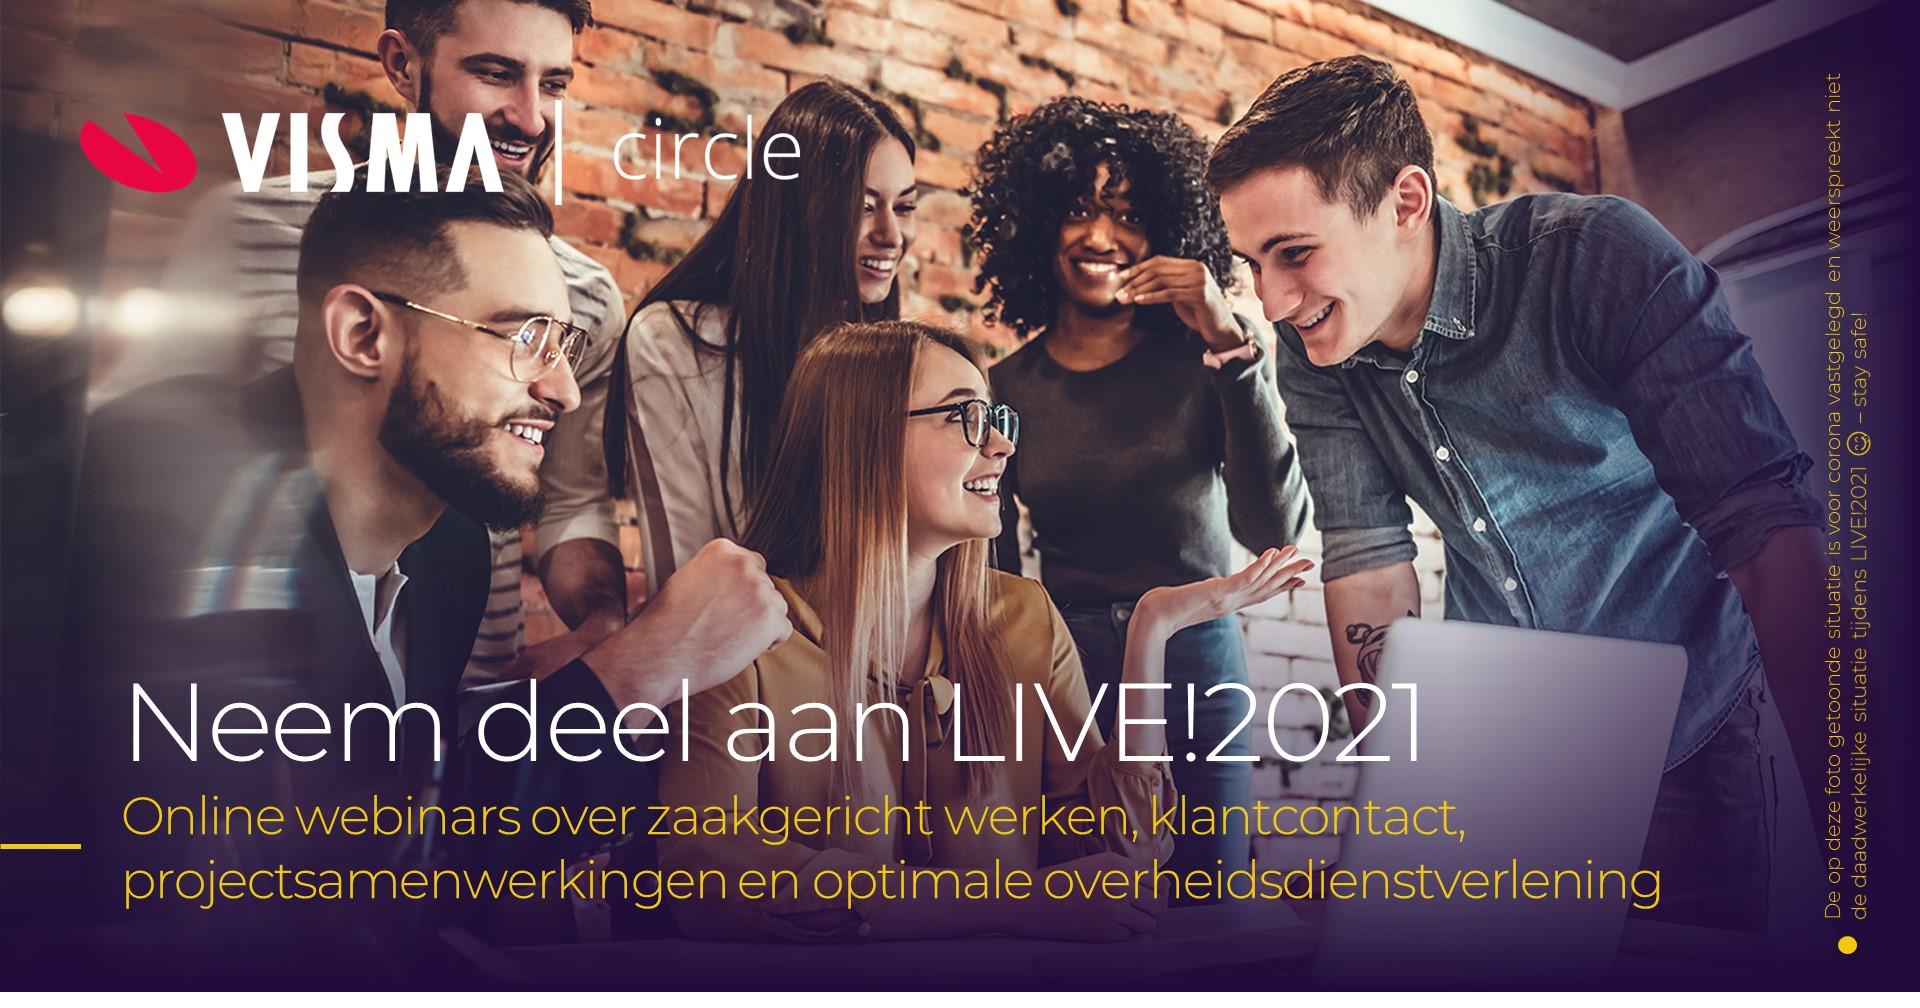 Visma Circle ook op LIVE!2021